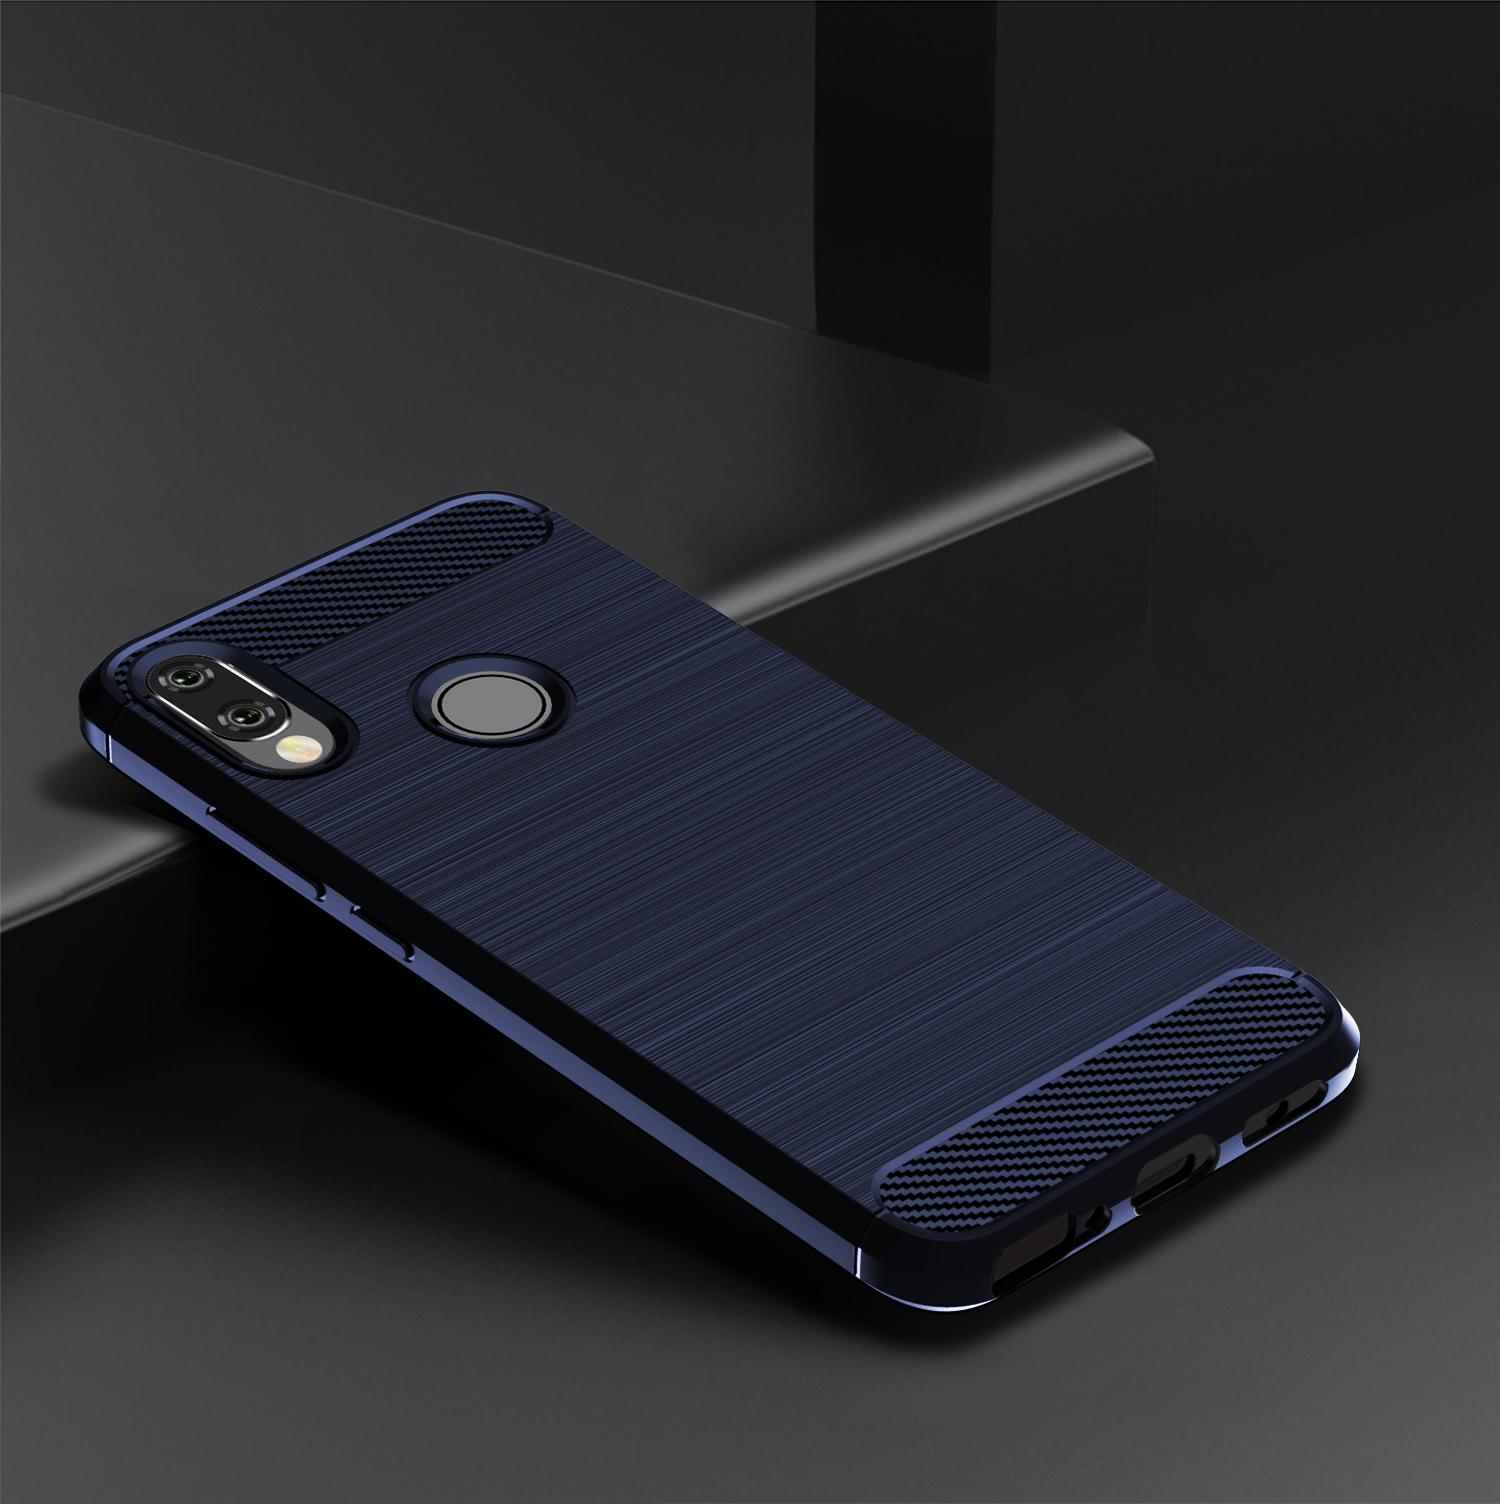 Чехол Xiaomi Redmi Note 7 (Note 7S, Note 7 Pro) цвет Blue (синий), серия Carbon, Caseport